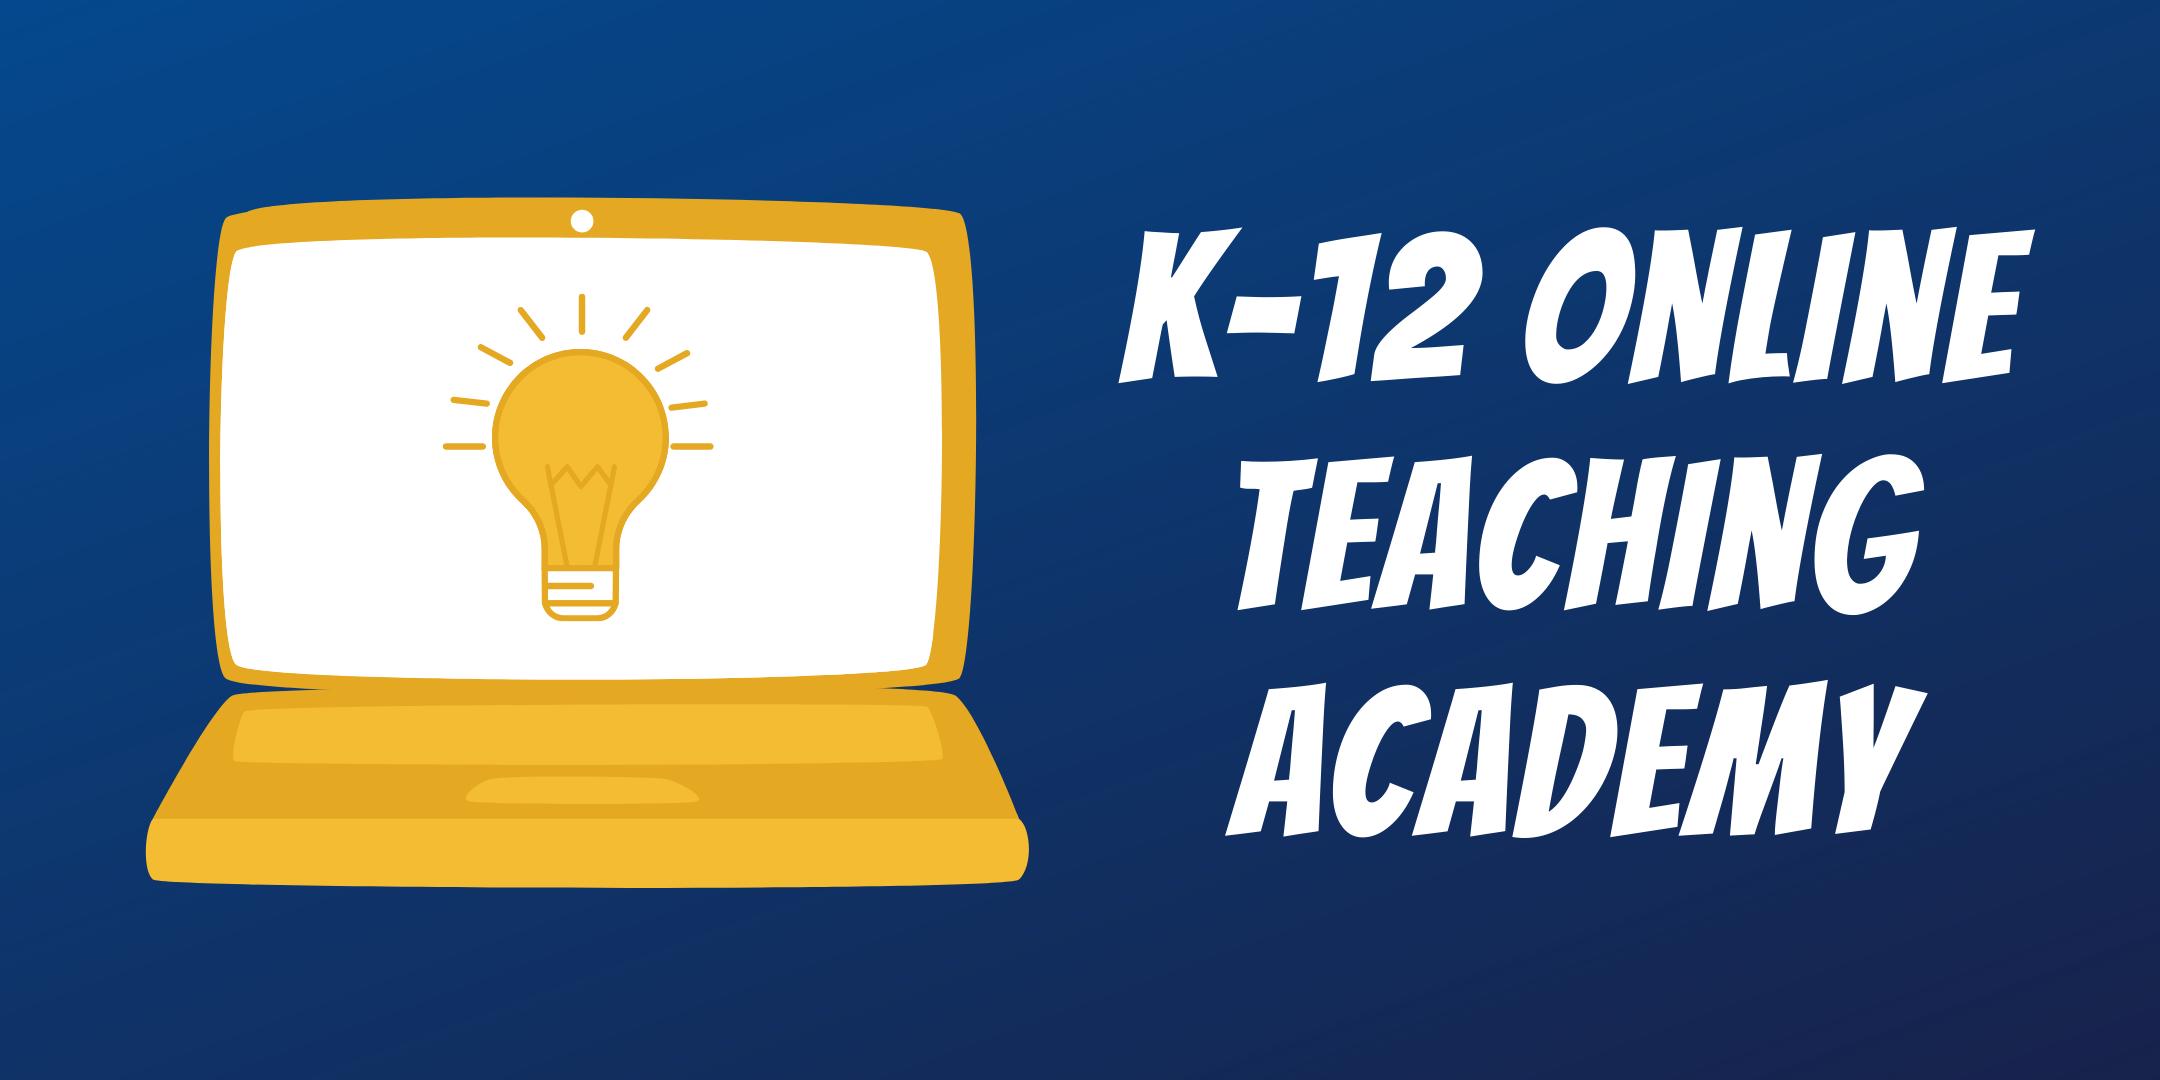 K 12 Online Teaching Academy Connie L Lurie College Of Education Online Teaching Teaching Teaching Skills